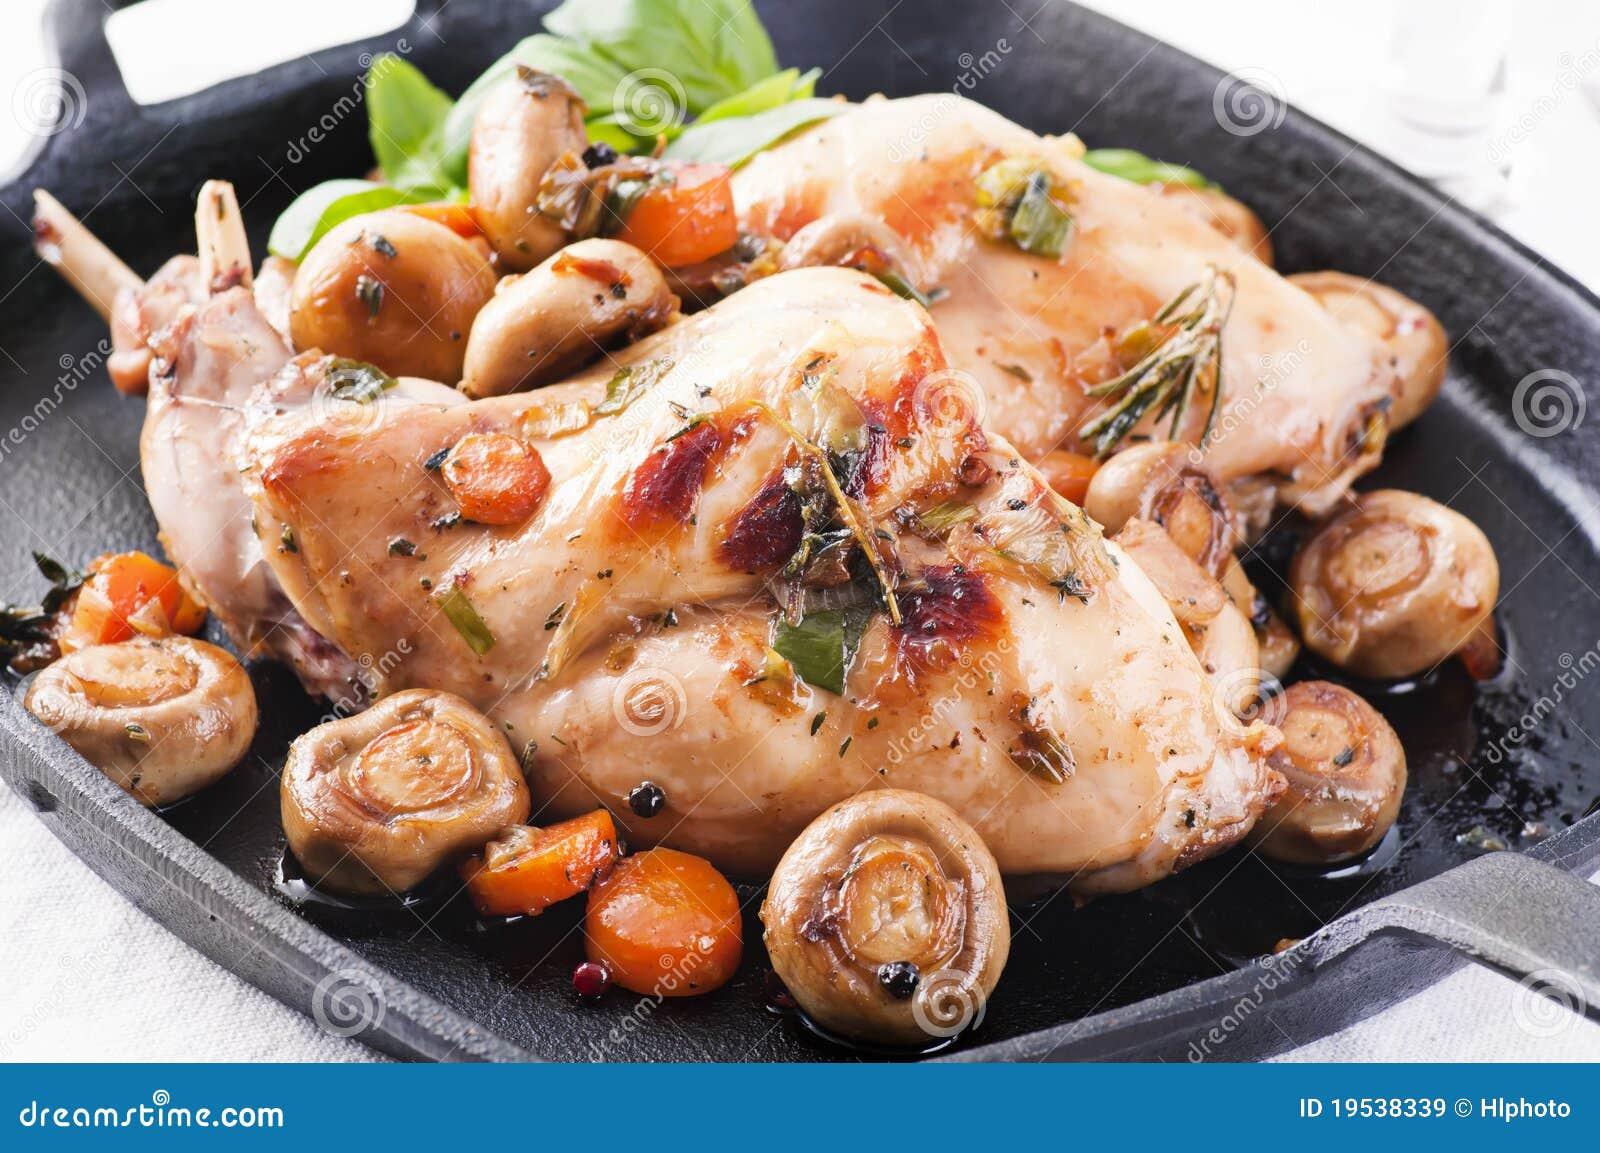 Download Rabbit roasted stock image. Image of piece, mushroom - 19538339